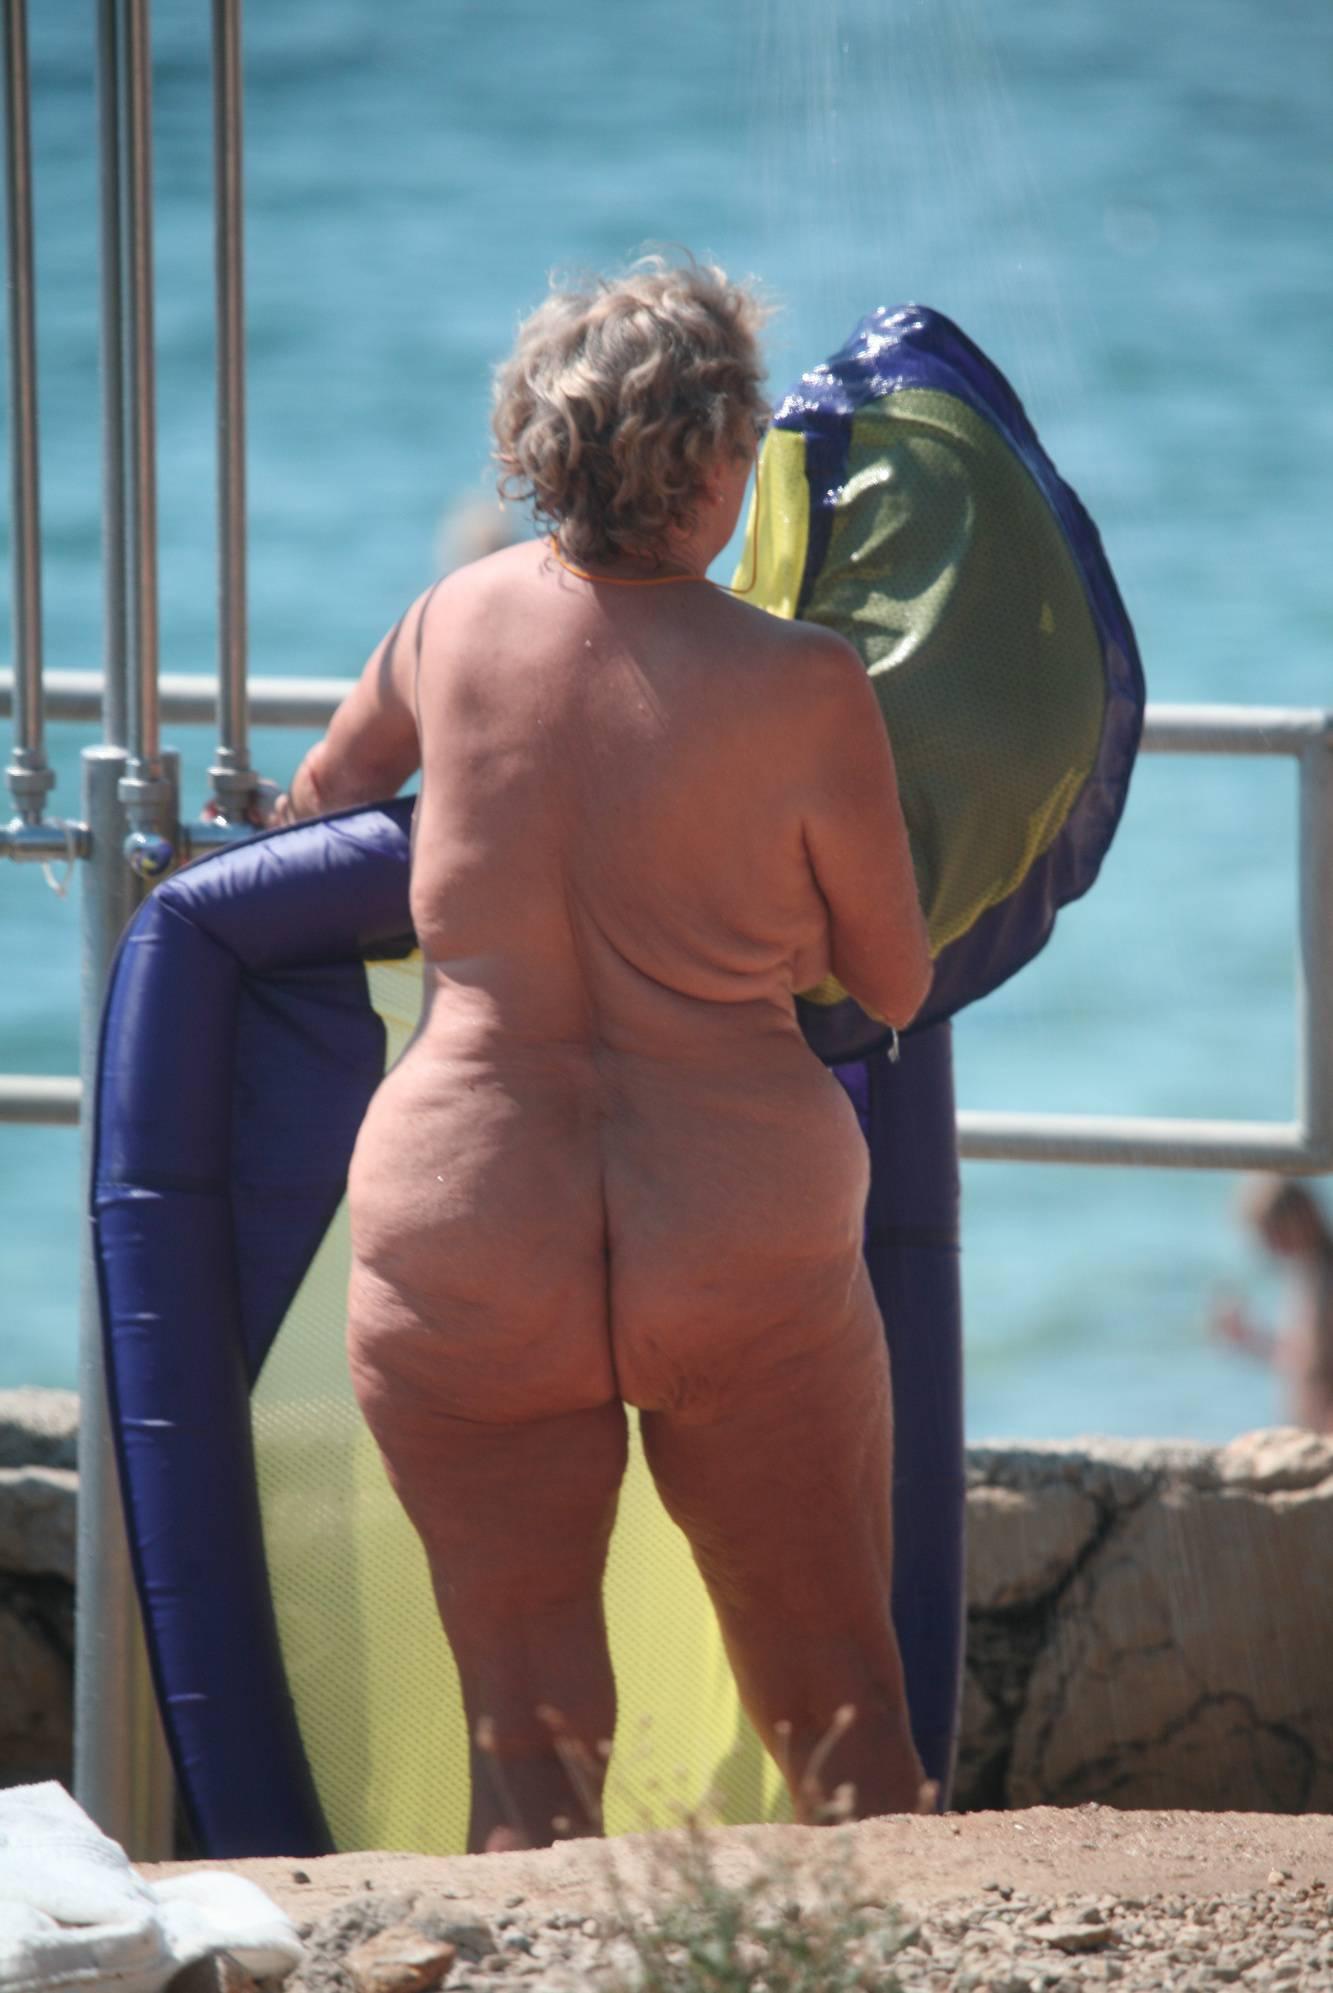 Nudist Gallery Crete FKK Shower Scenes - 2